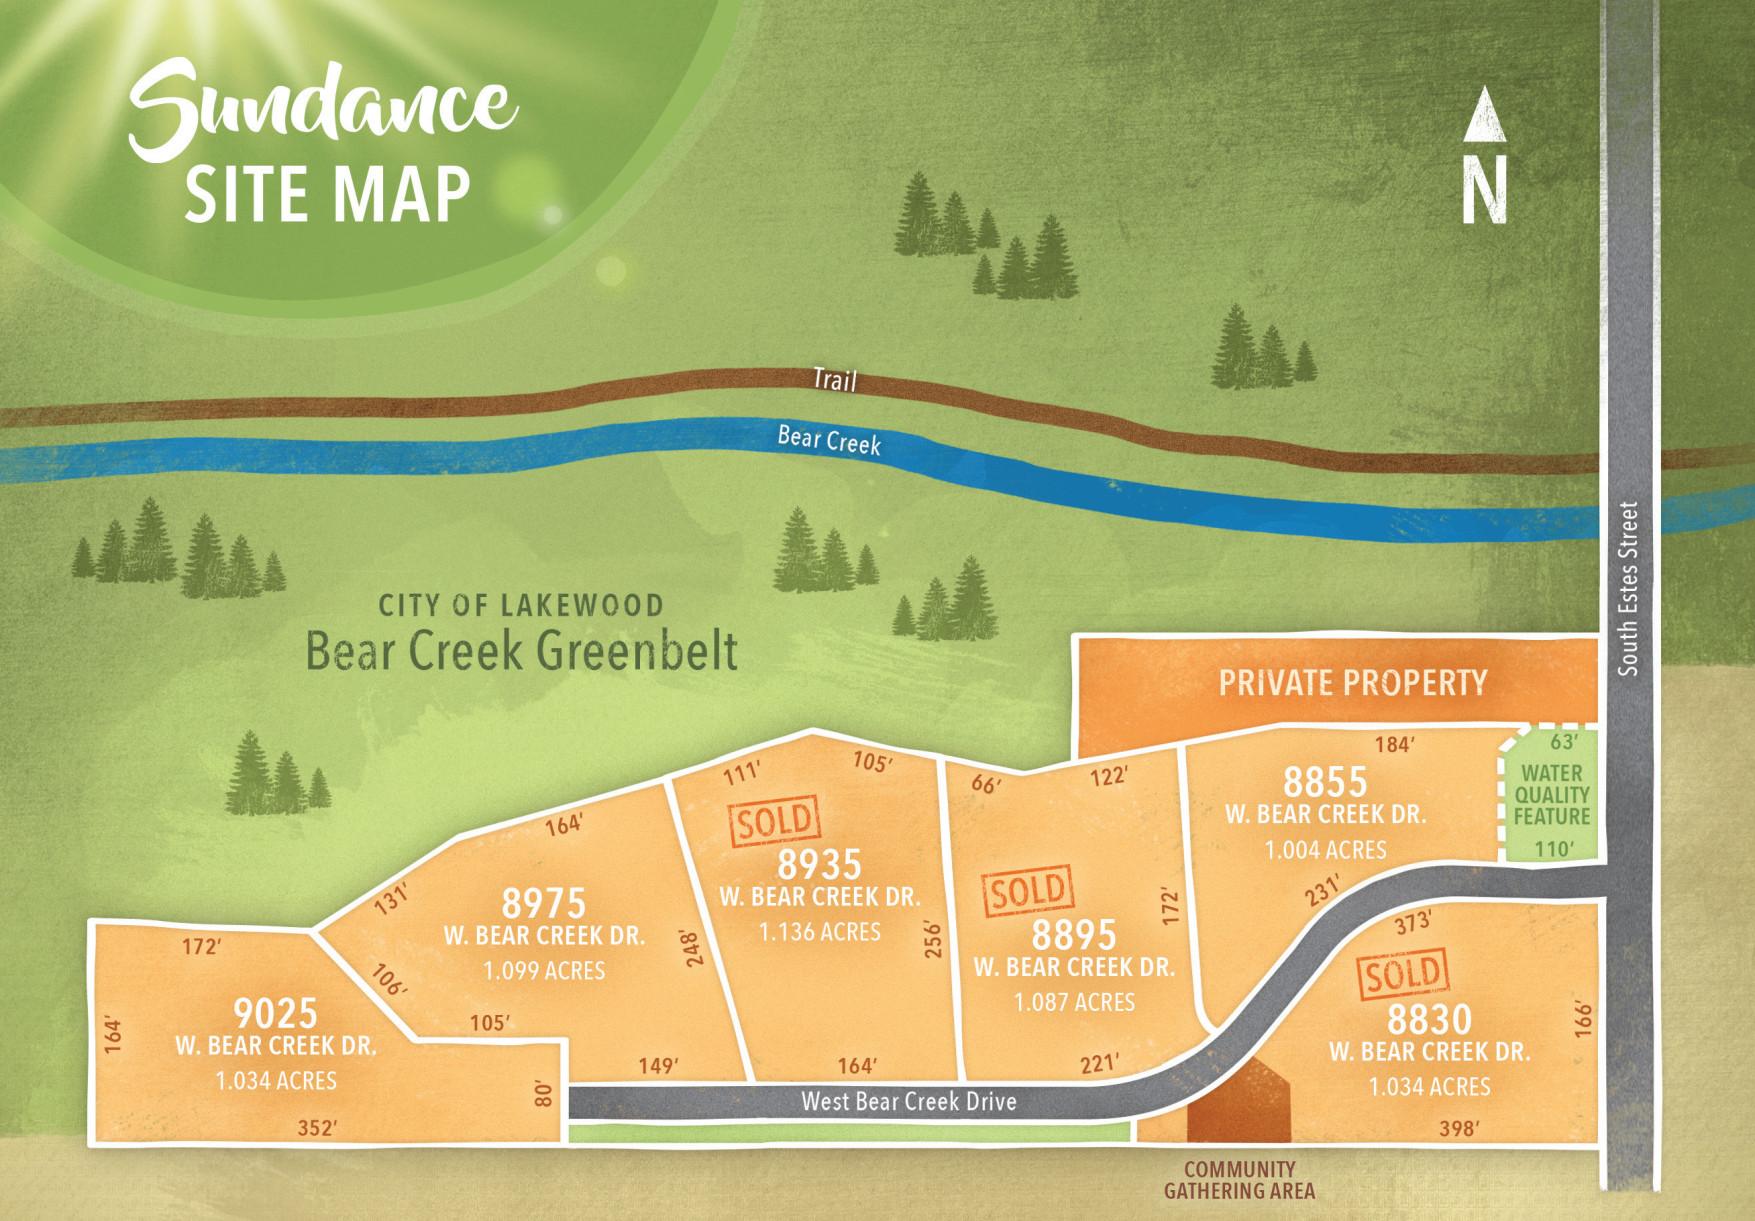 Sundance Custo Home Community Site Map